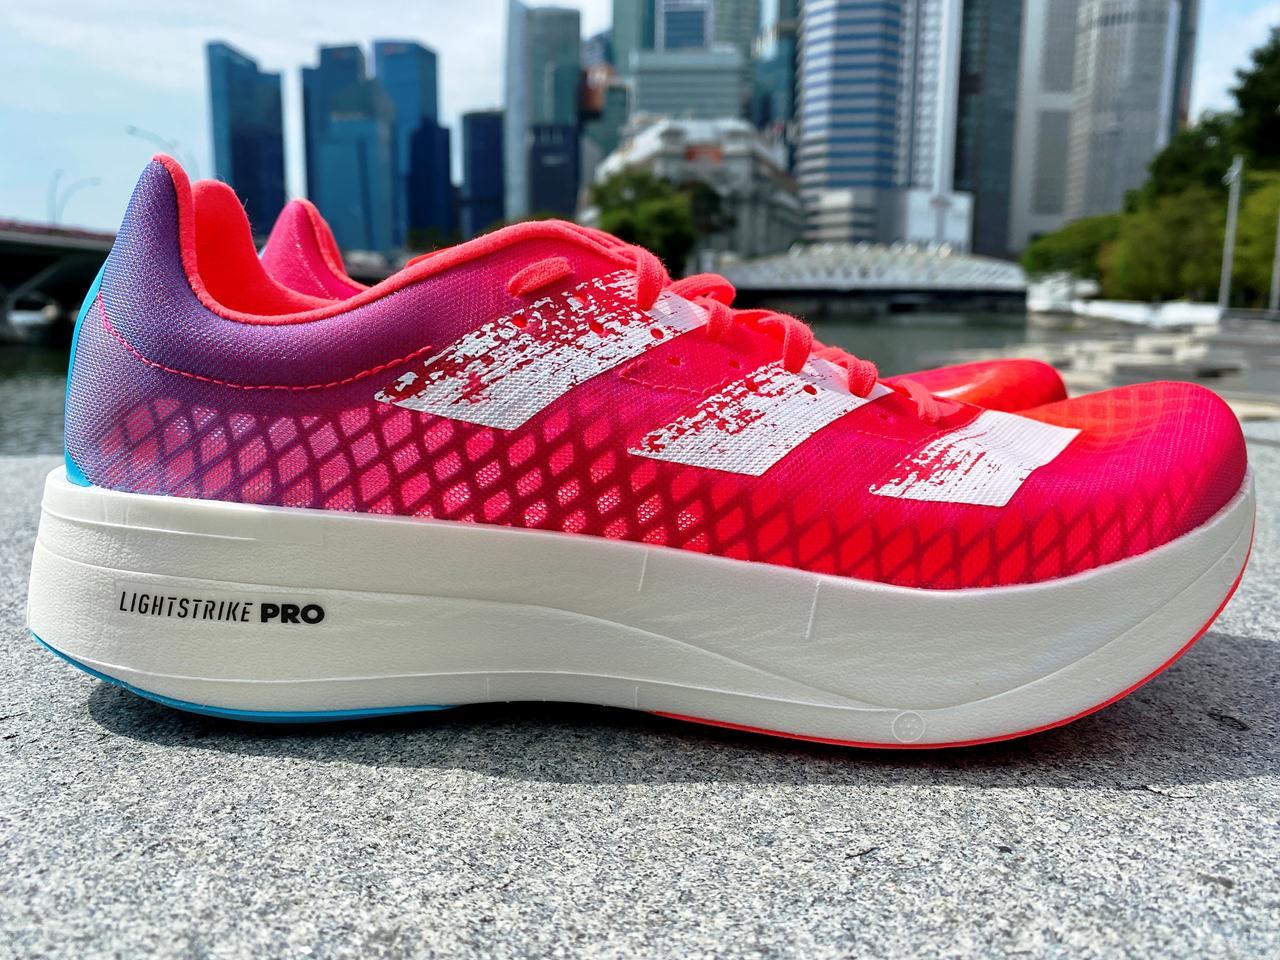 Adidas Adizero Adios Pro Review   Running Shoes Guru